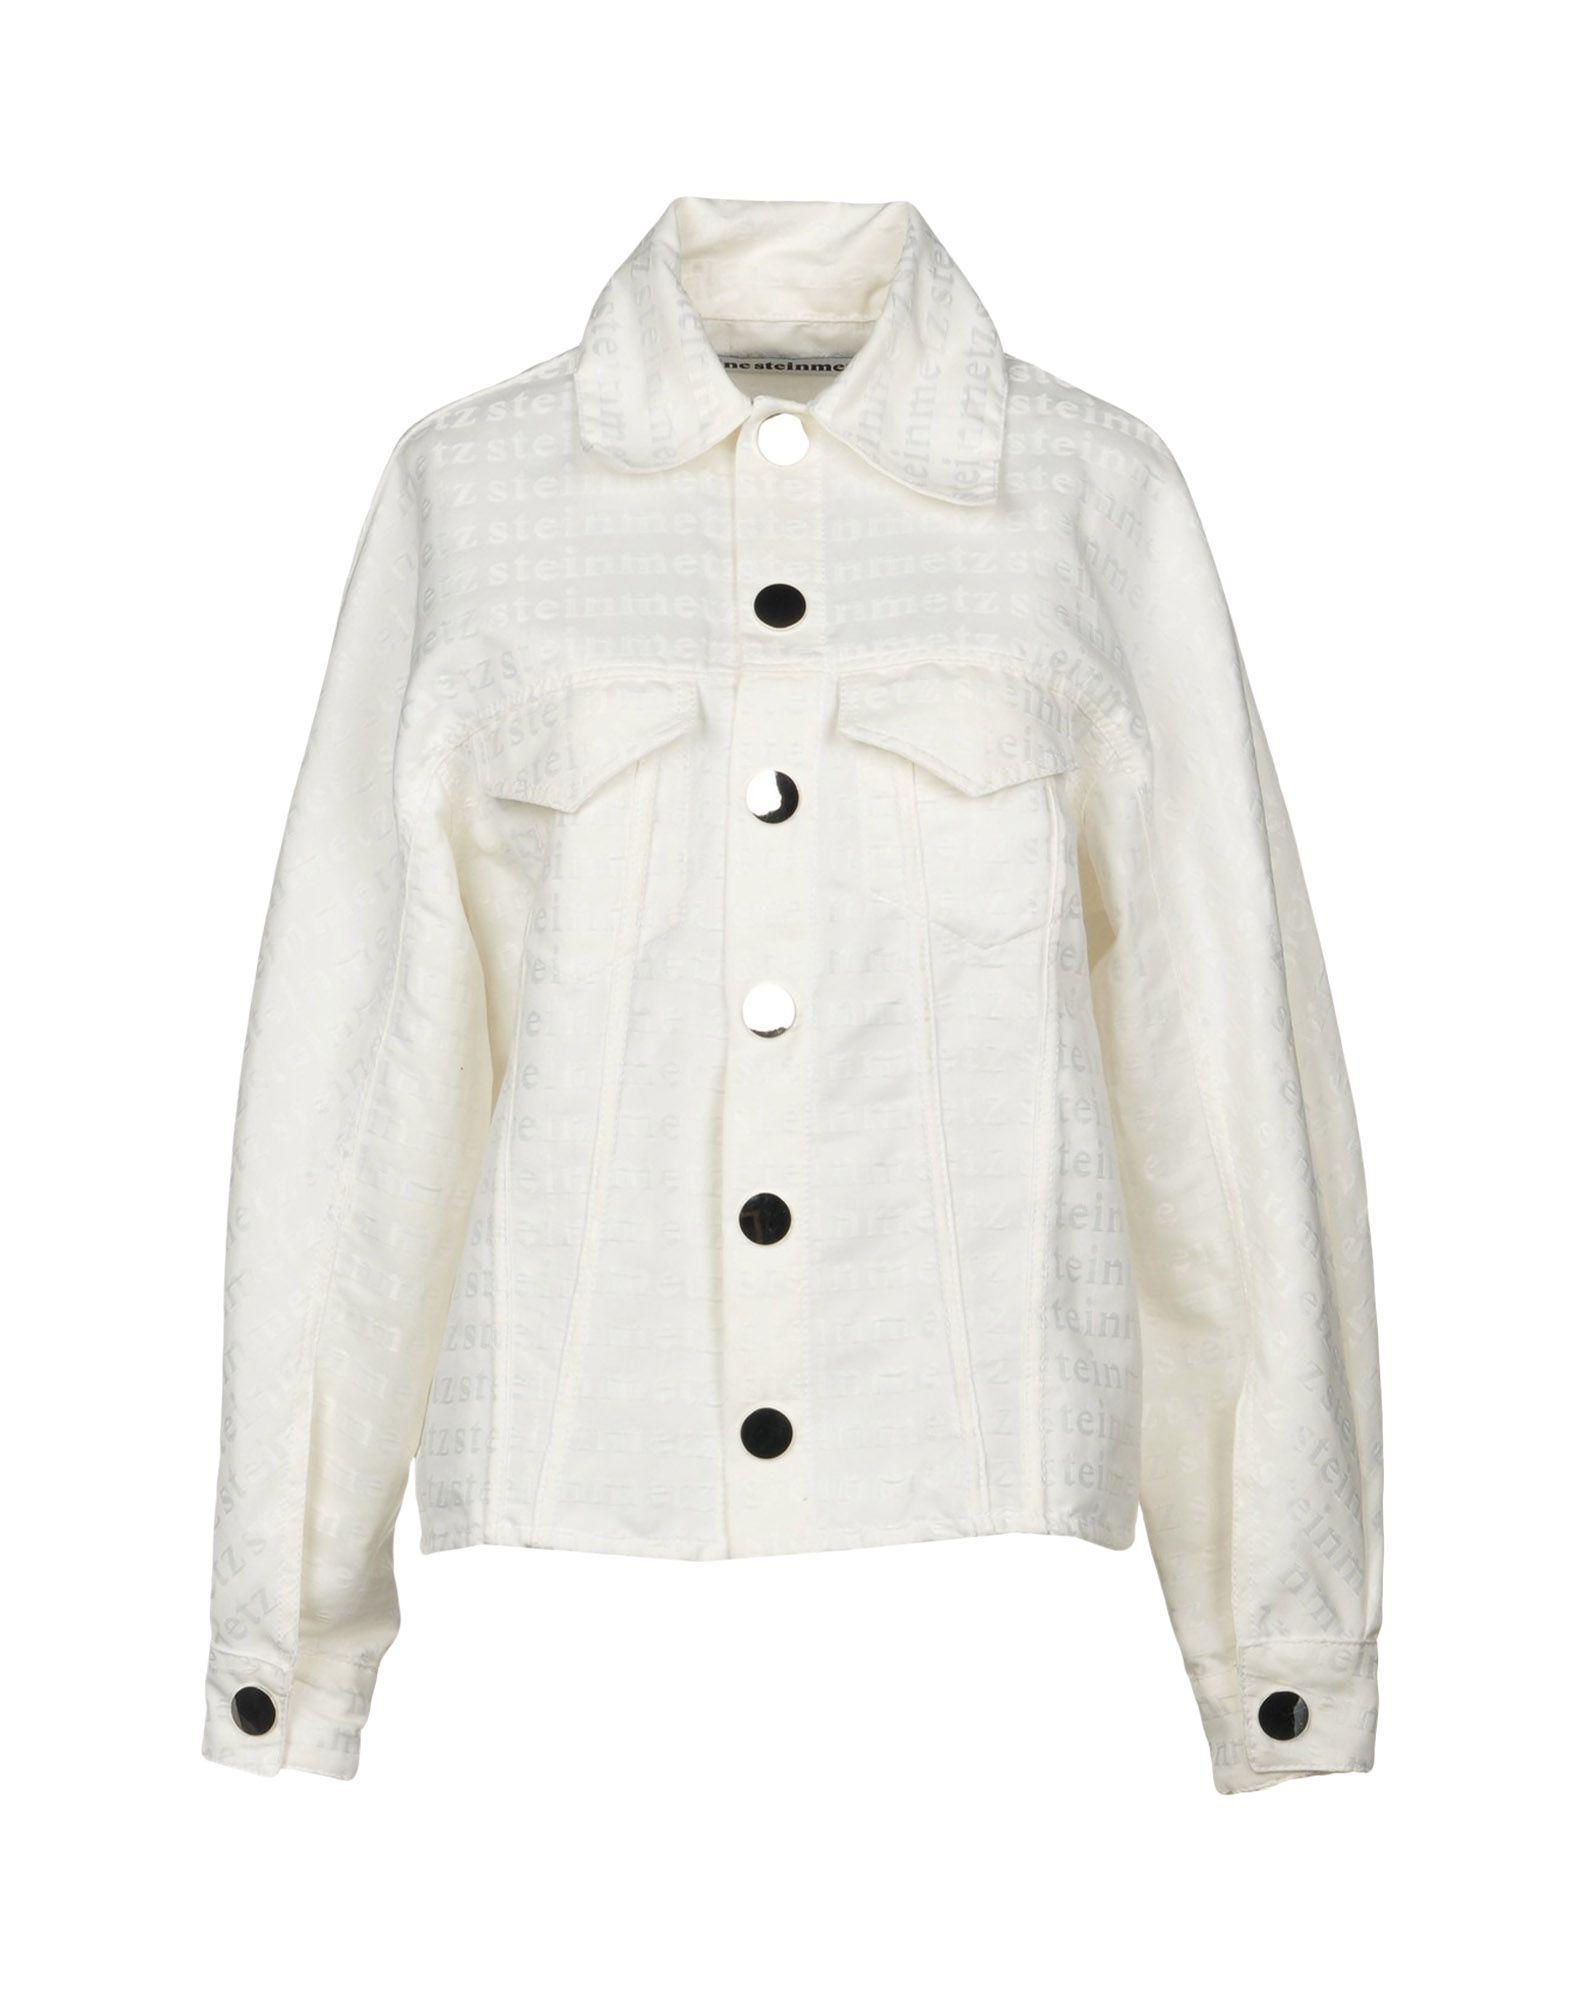 FAUSTINE STEINMETZ Jacket in White